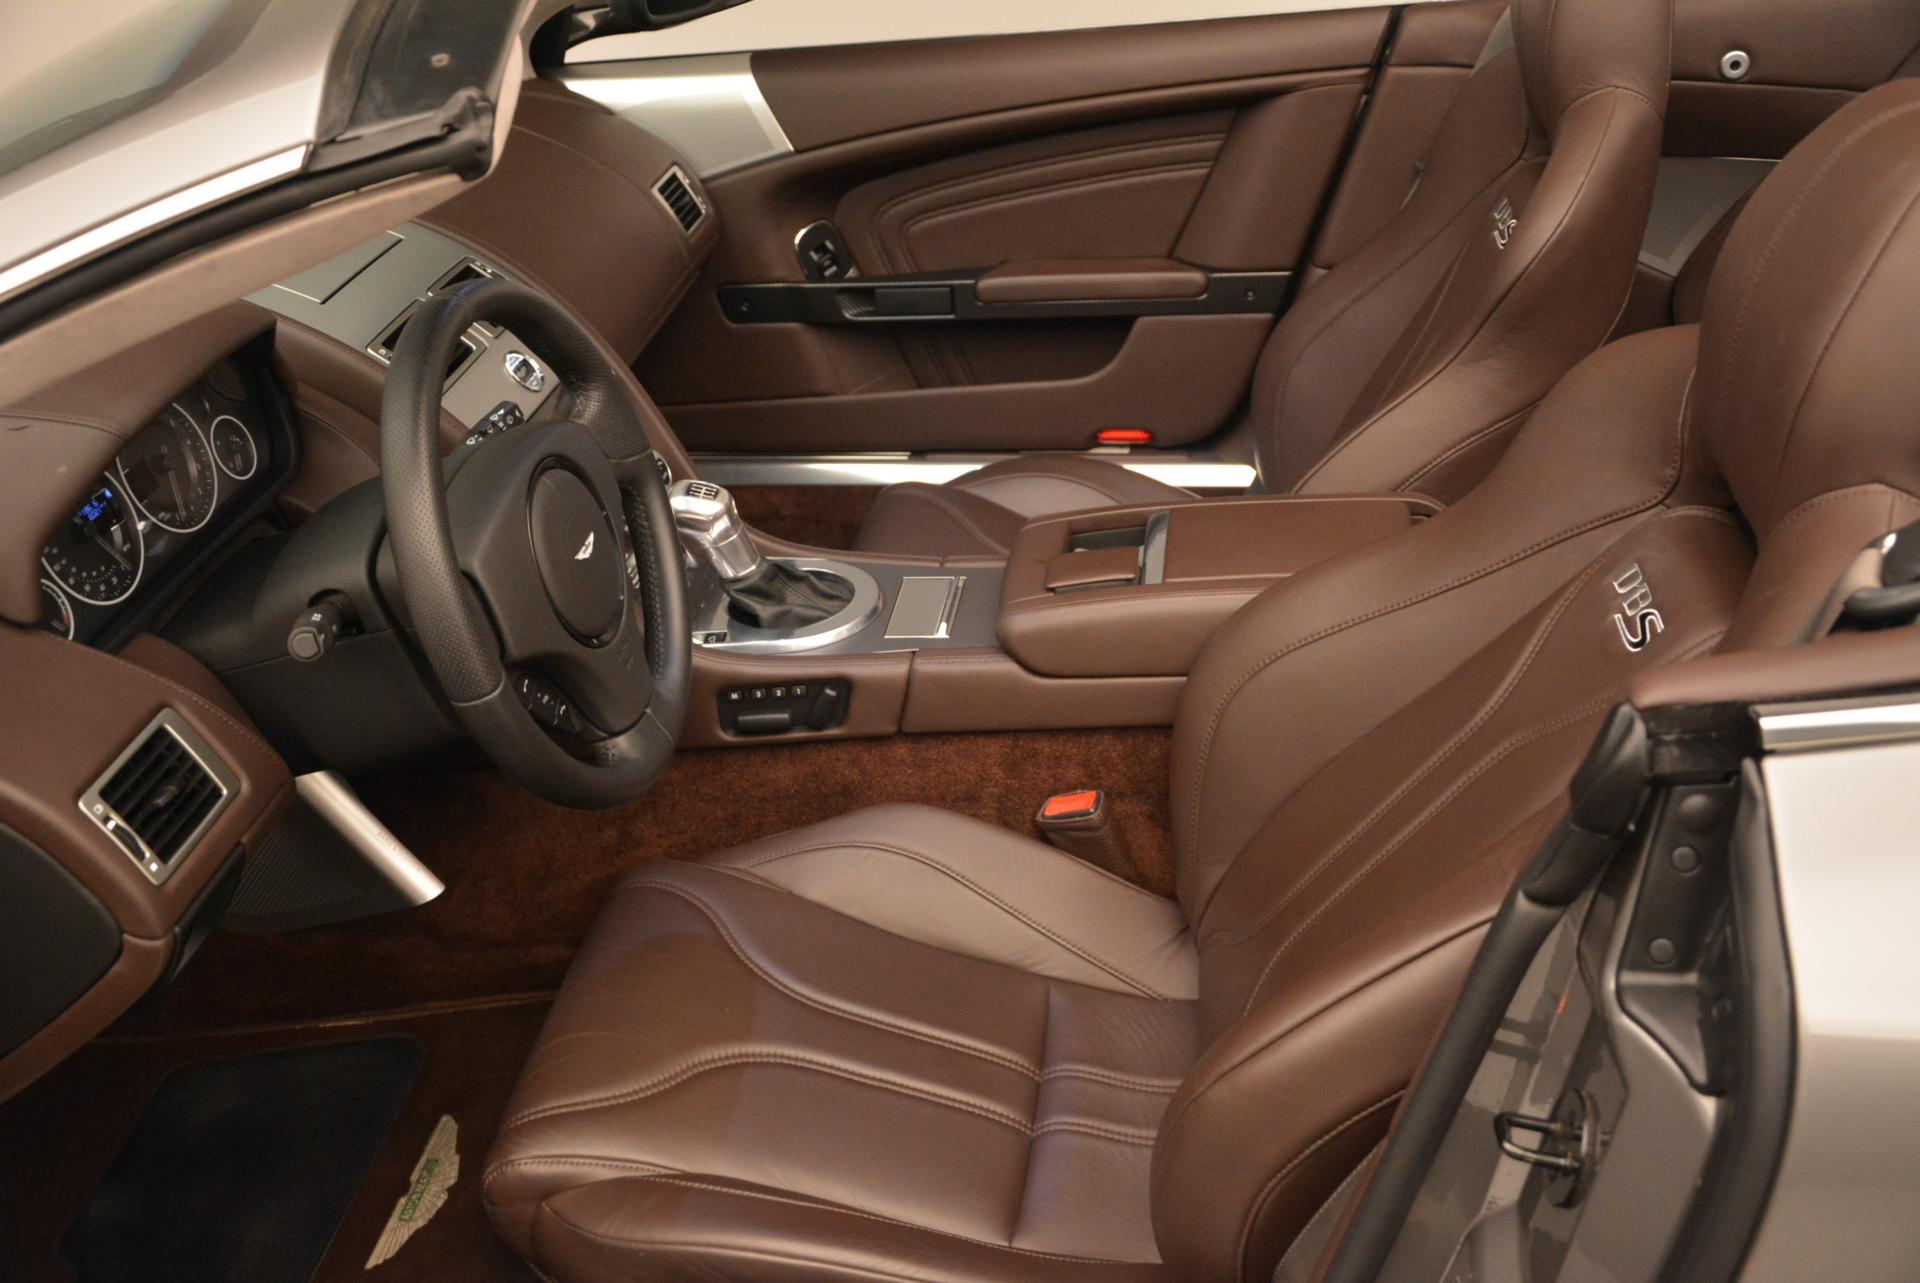 Used 2010 Aston Martin DBS Volante For Sale In Greenwich, CT 87_p26